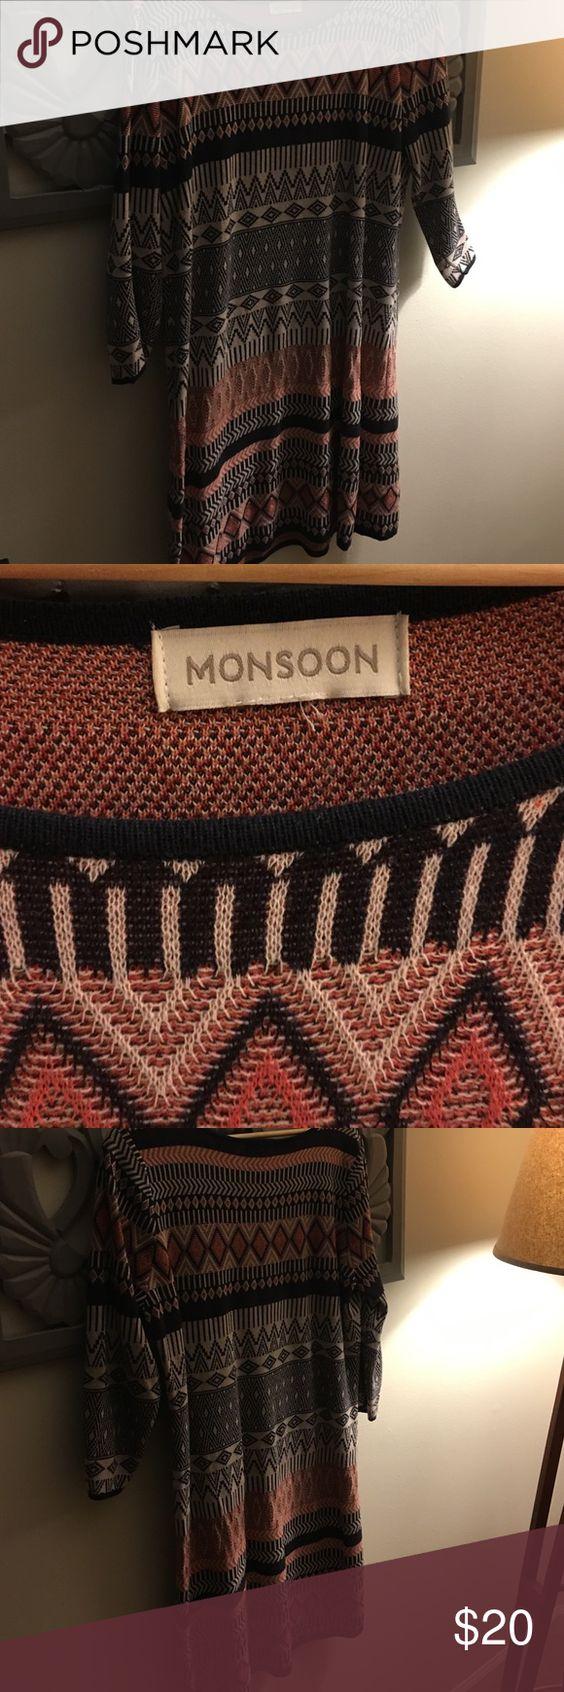 Great light weight knit dress Excellent condition, beautiful pattern Monsoon knit dress❤️ Monsoon Dresses Midi